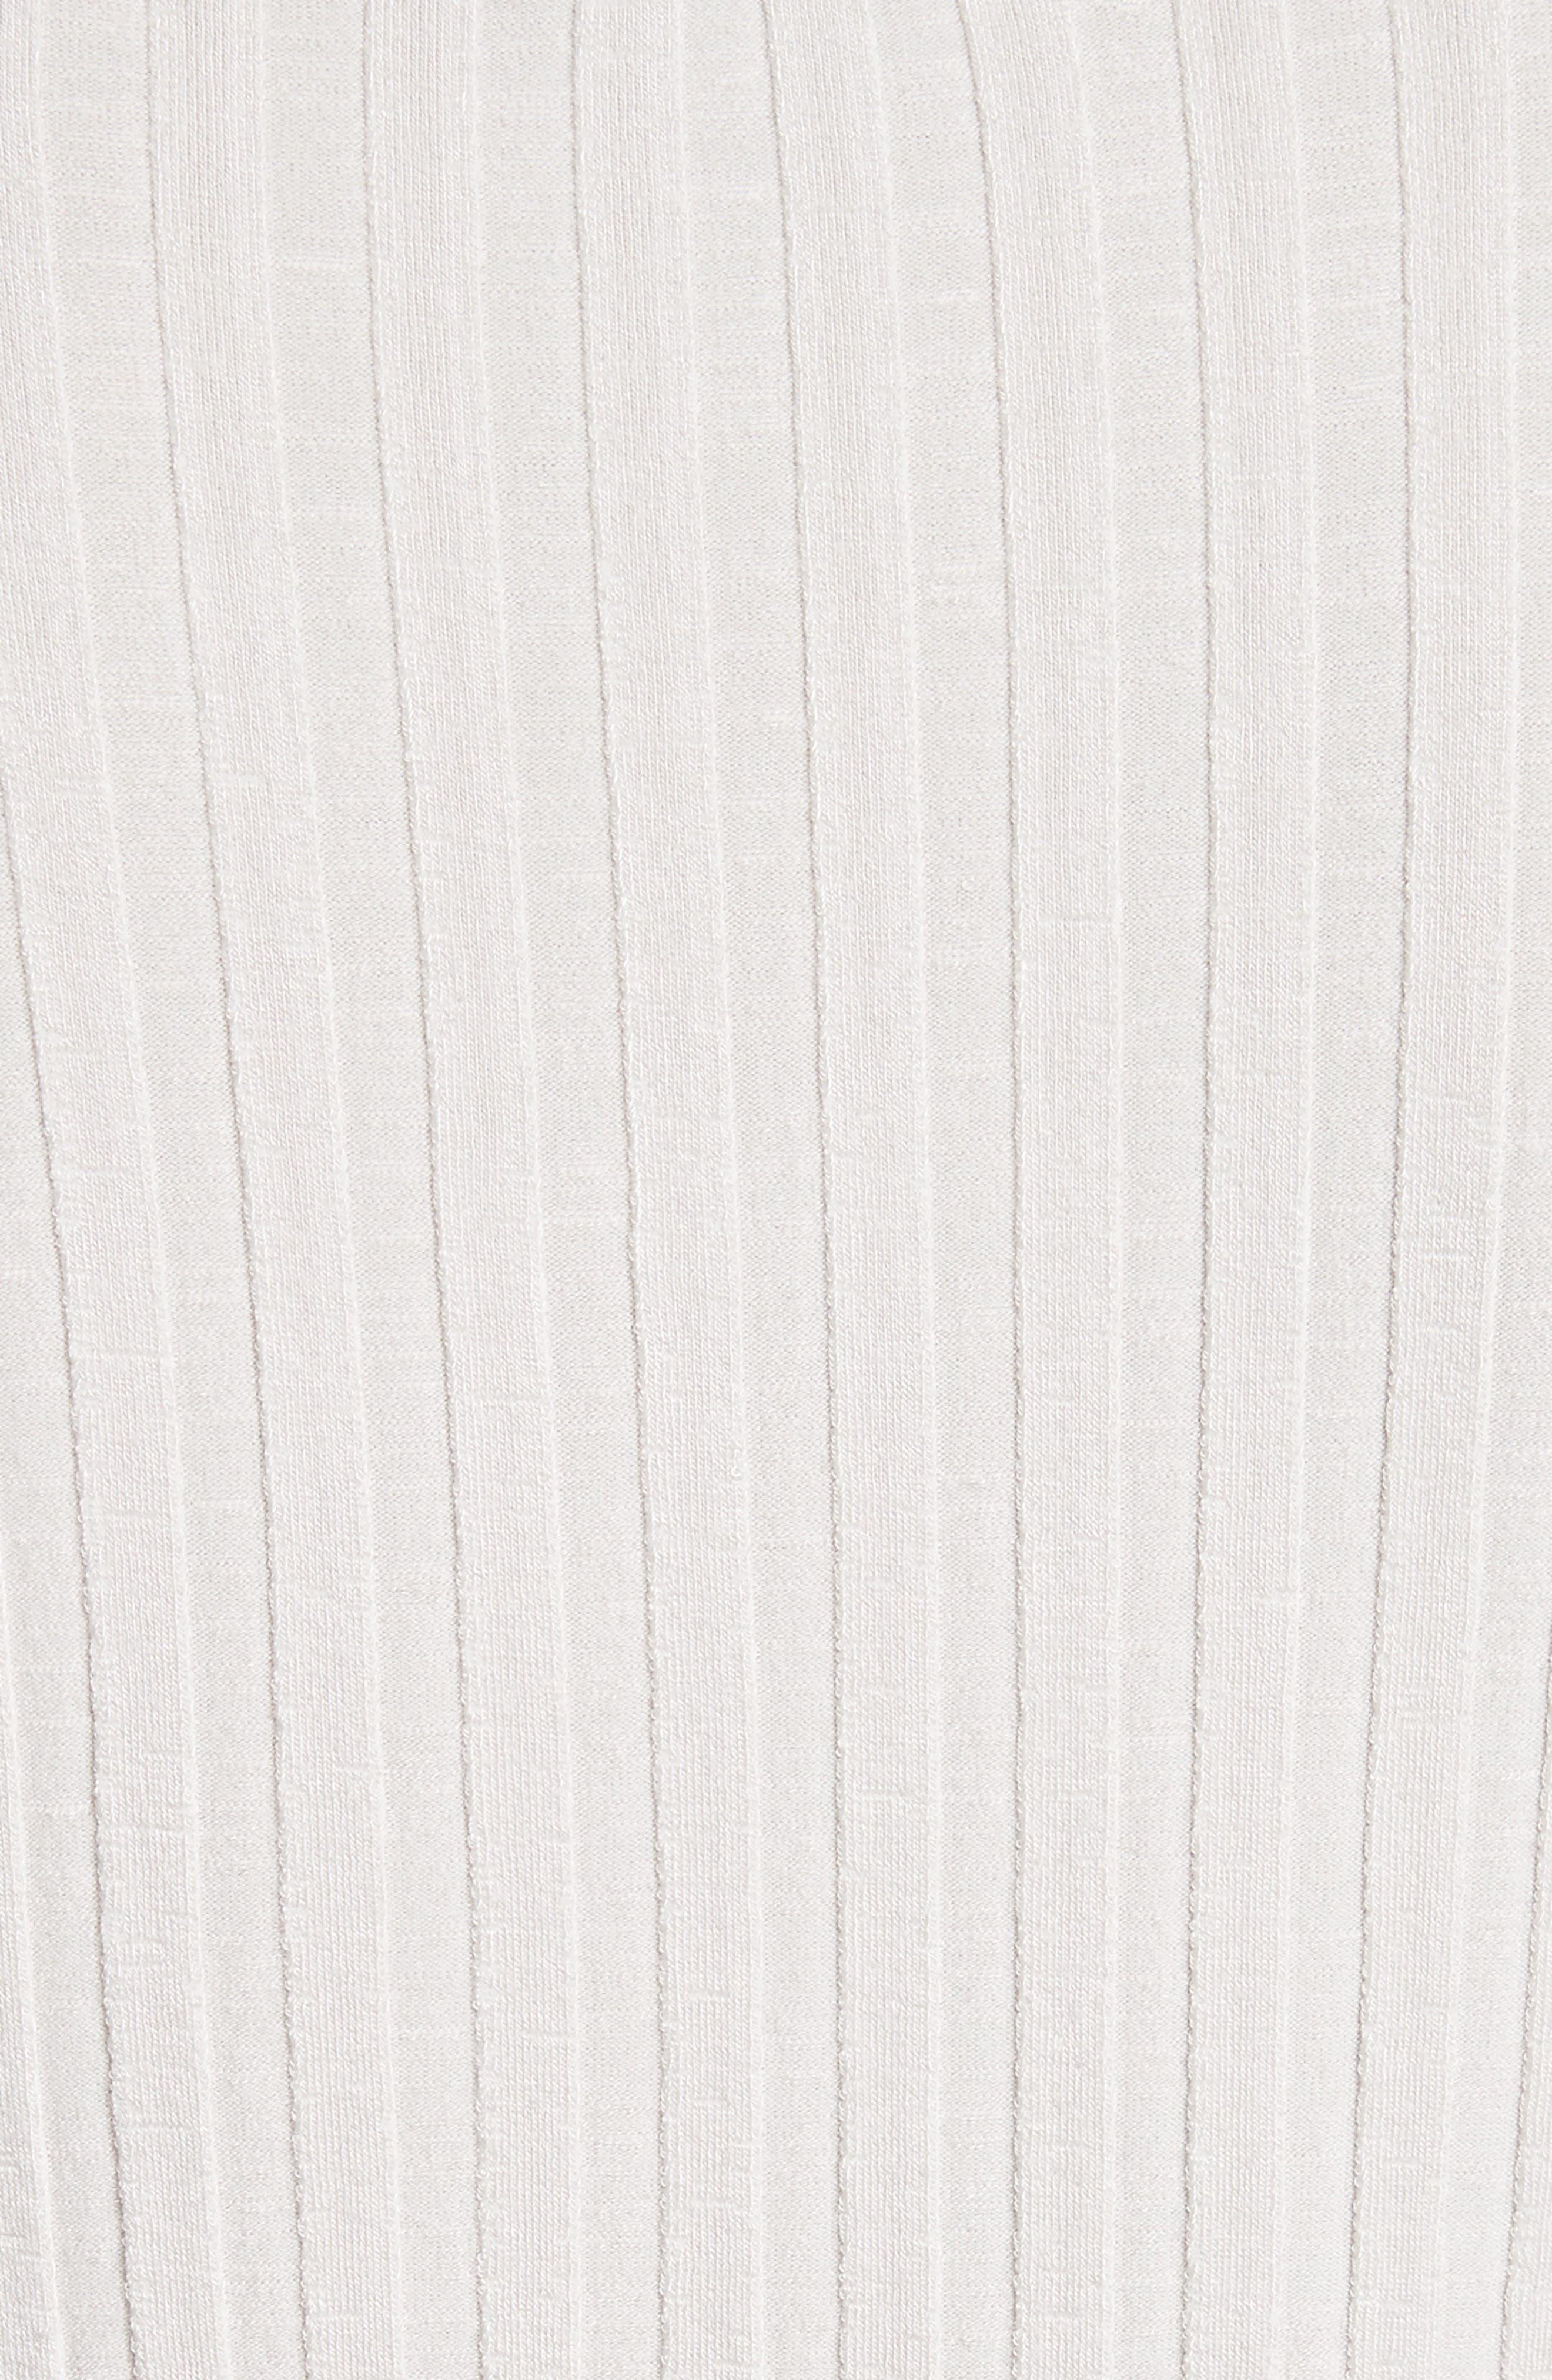 Devola Rib Knit Tee,                             Alternate thumbnail 5, color,                             020